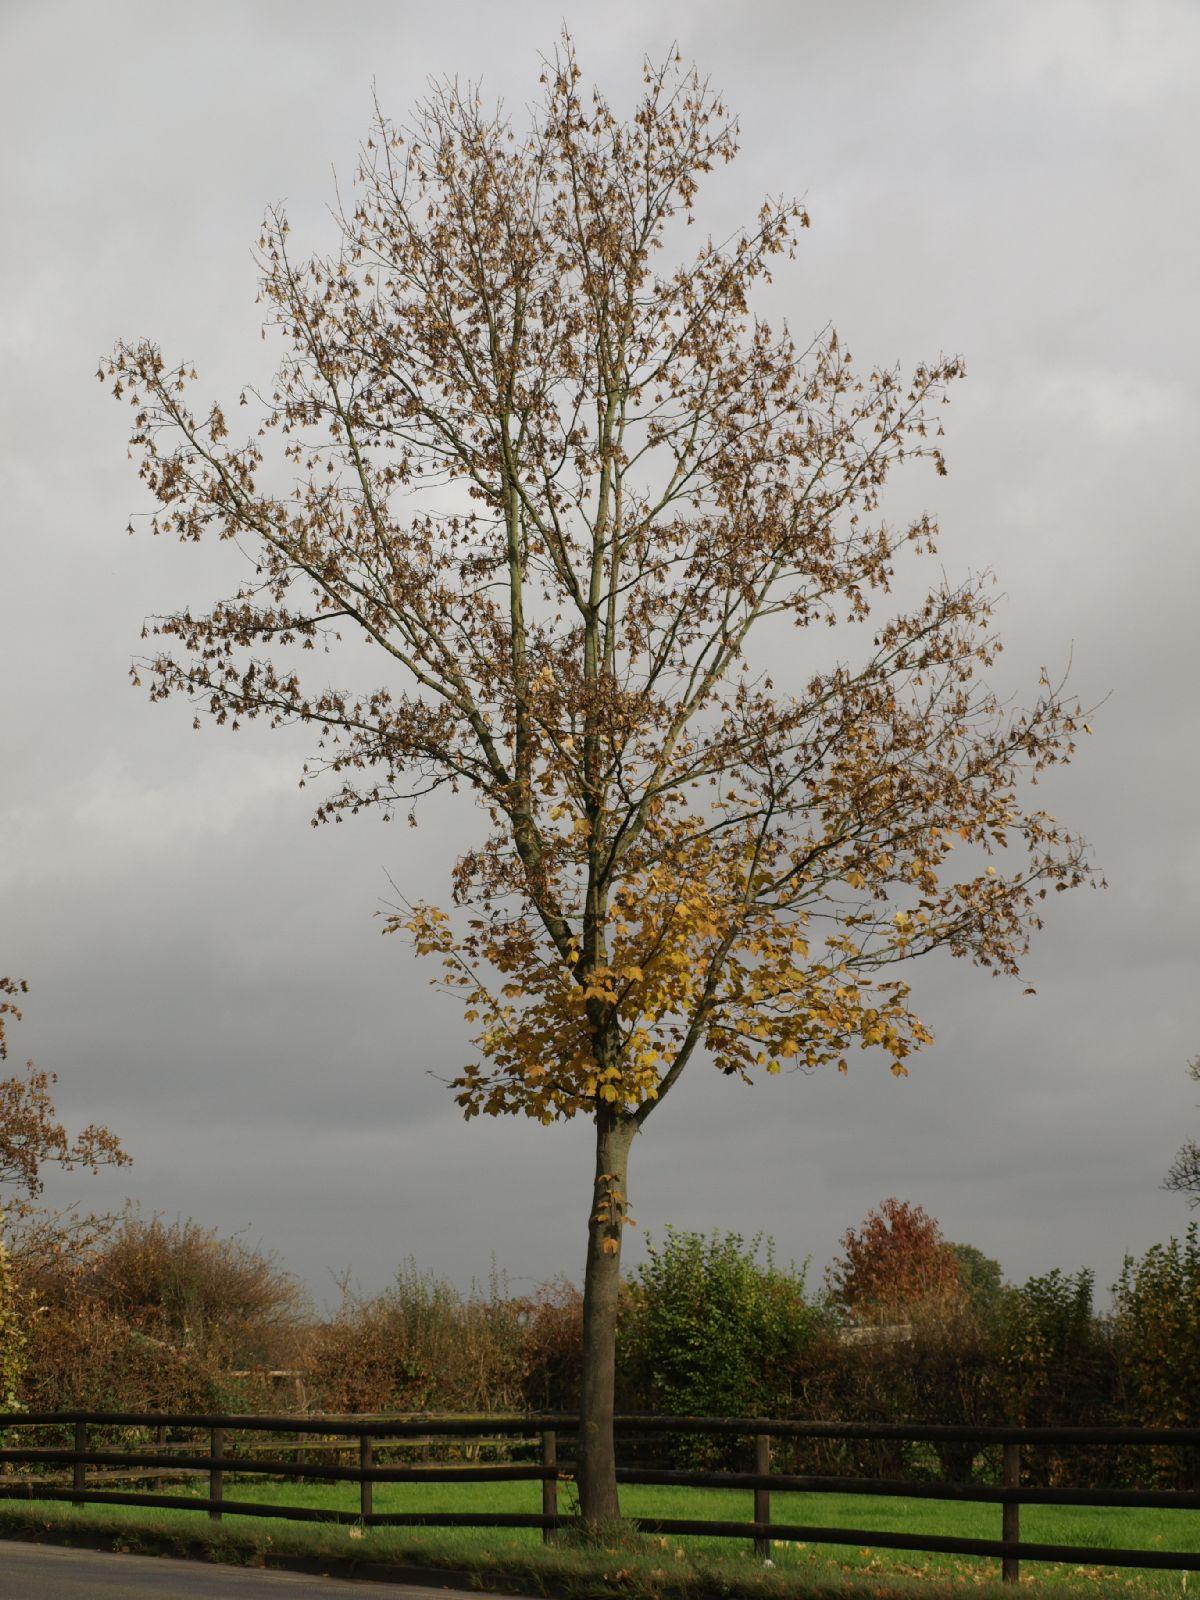 Pflanzen-Baum-Foto_Textur_B_PA260548